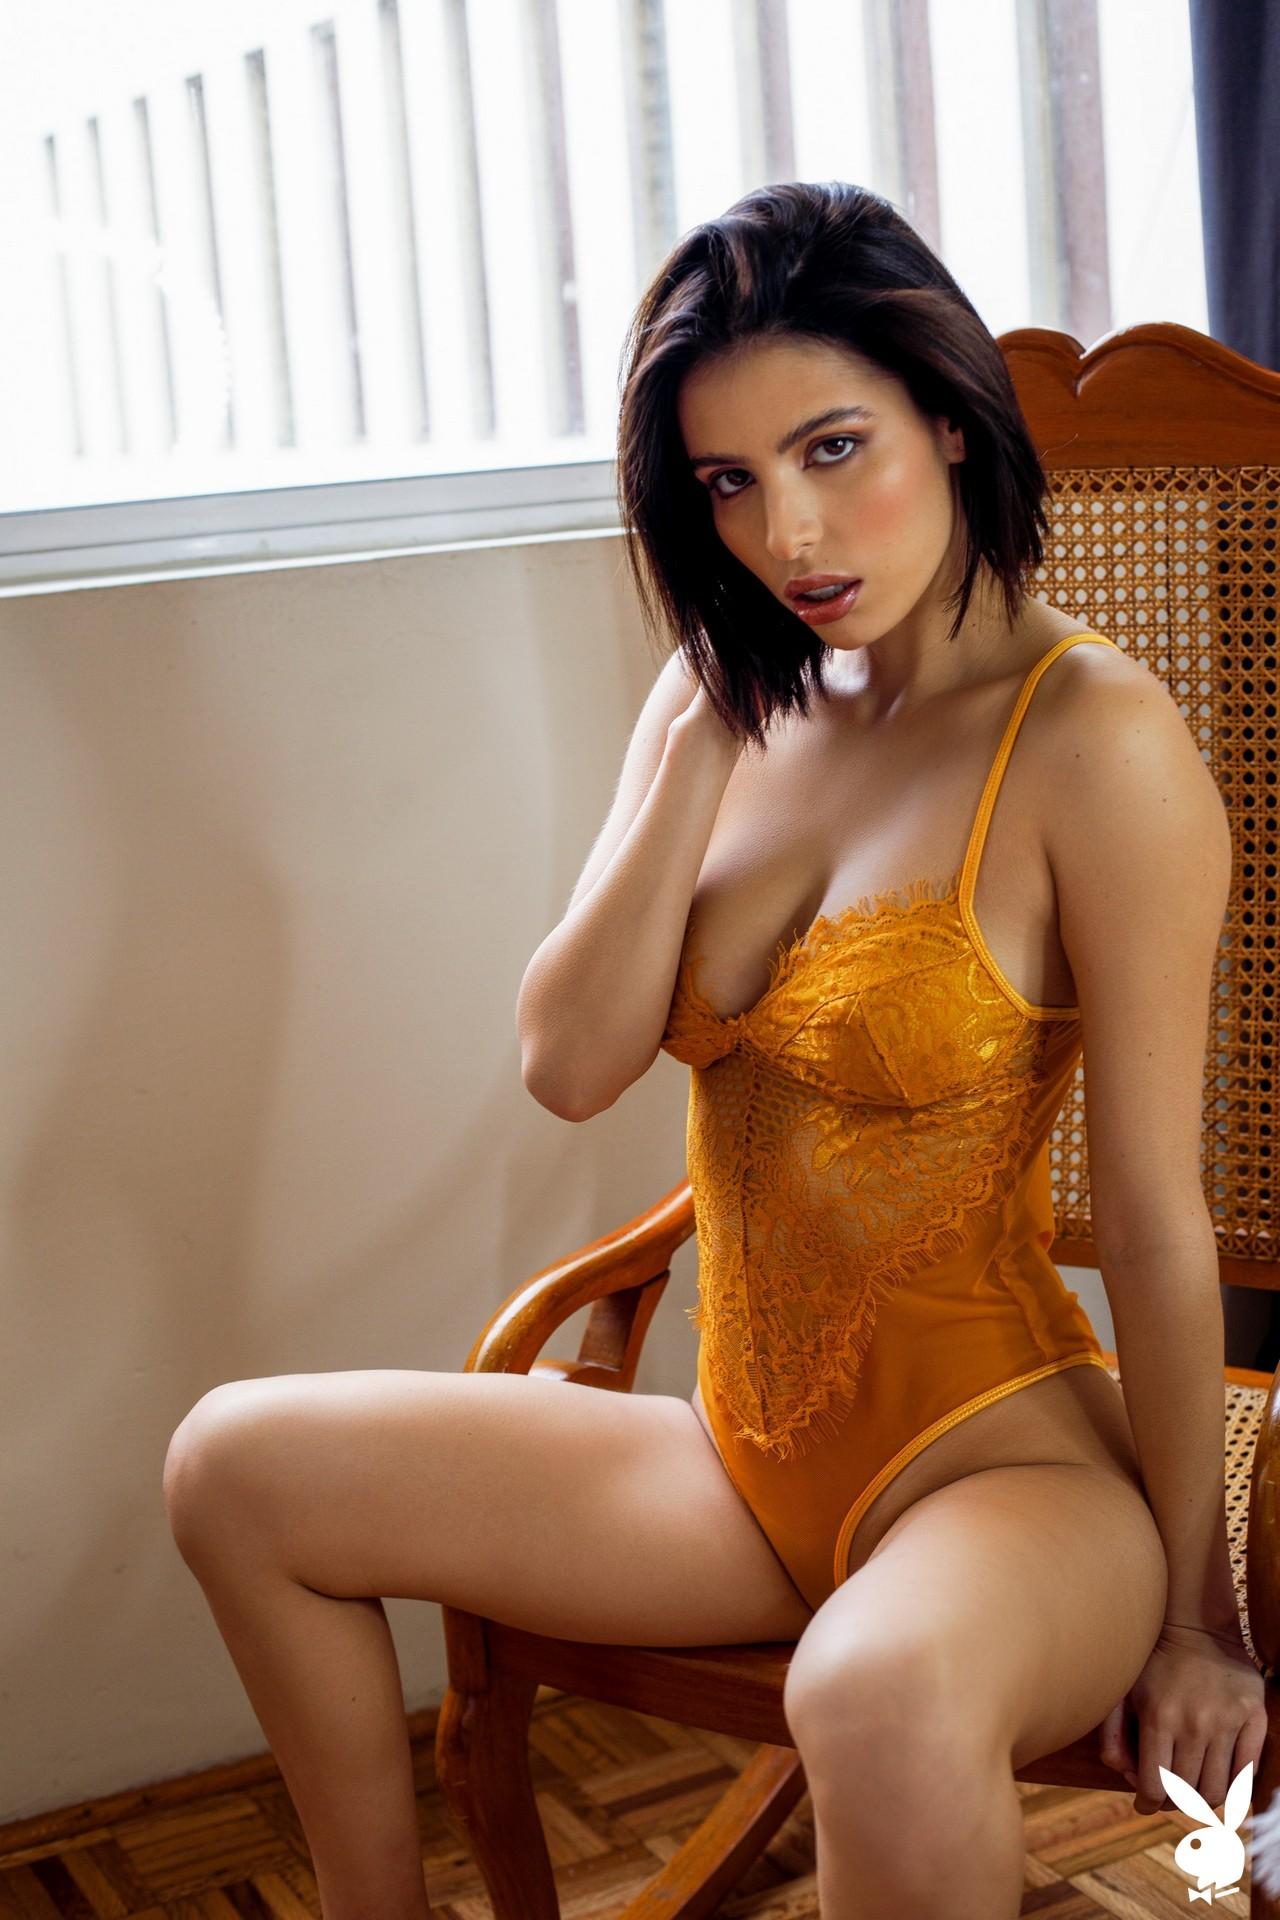 Fernanda Pacheco In Light Reading Playboy Plus (2)